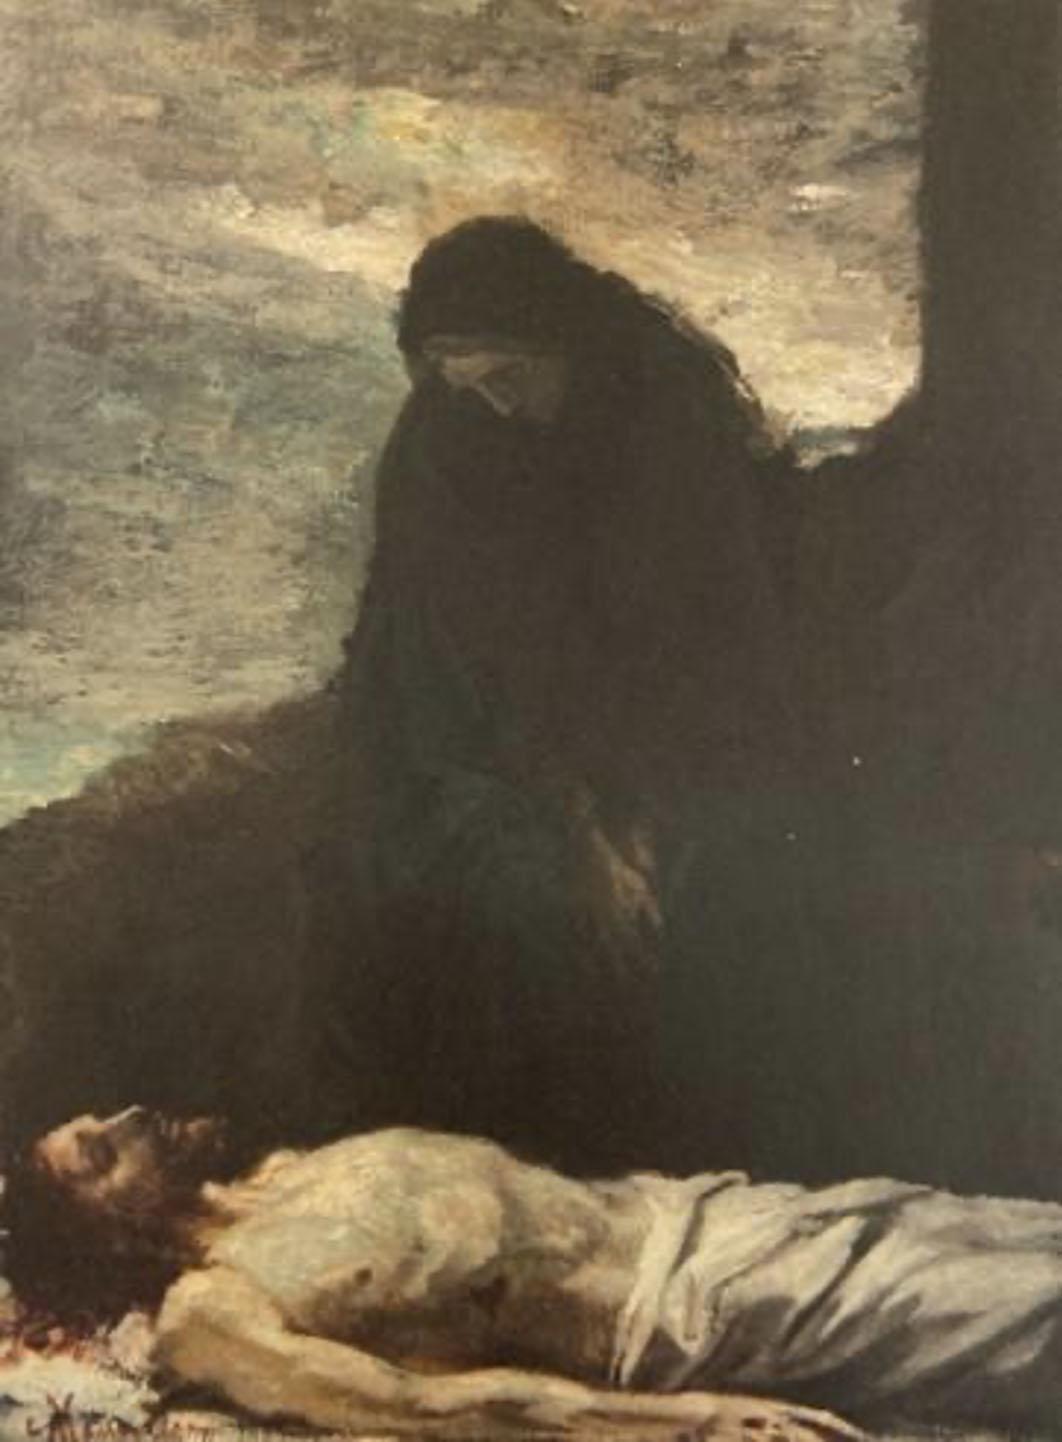 Constantin Meunier, Lamentation, 1870, Private Collection, Patrick Derom Gallery, Brussells.